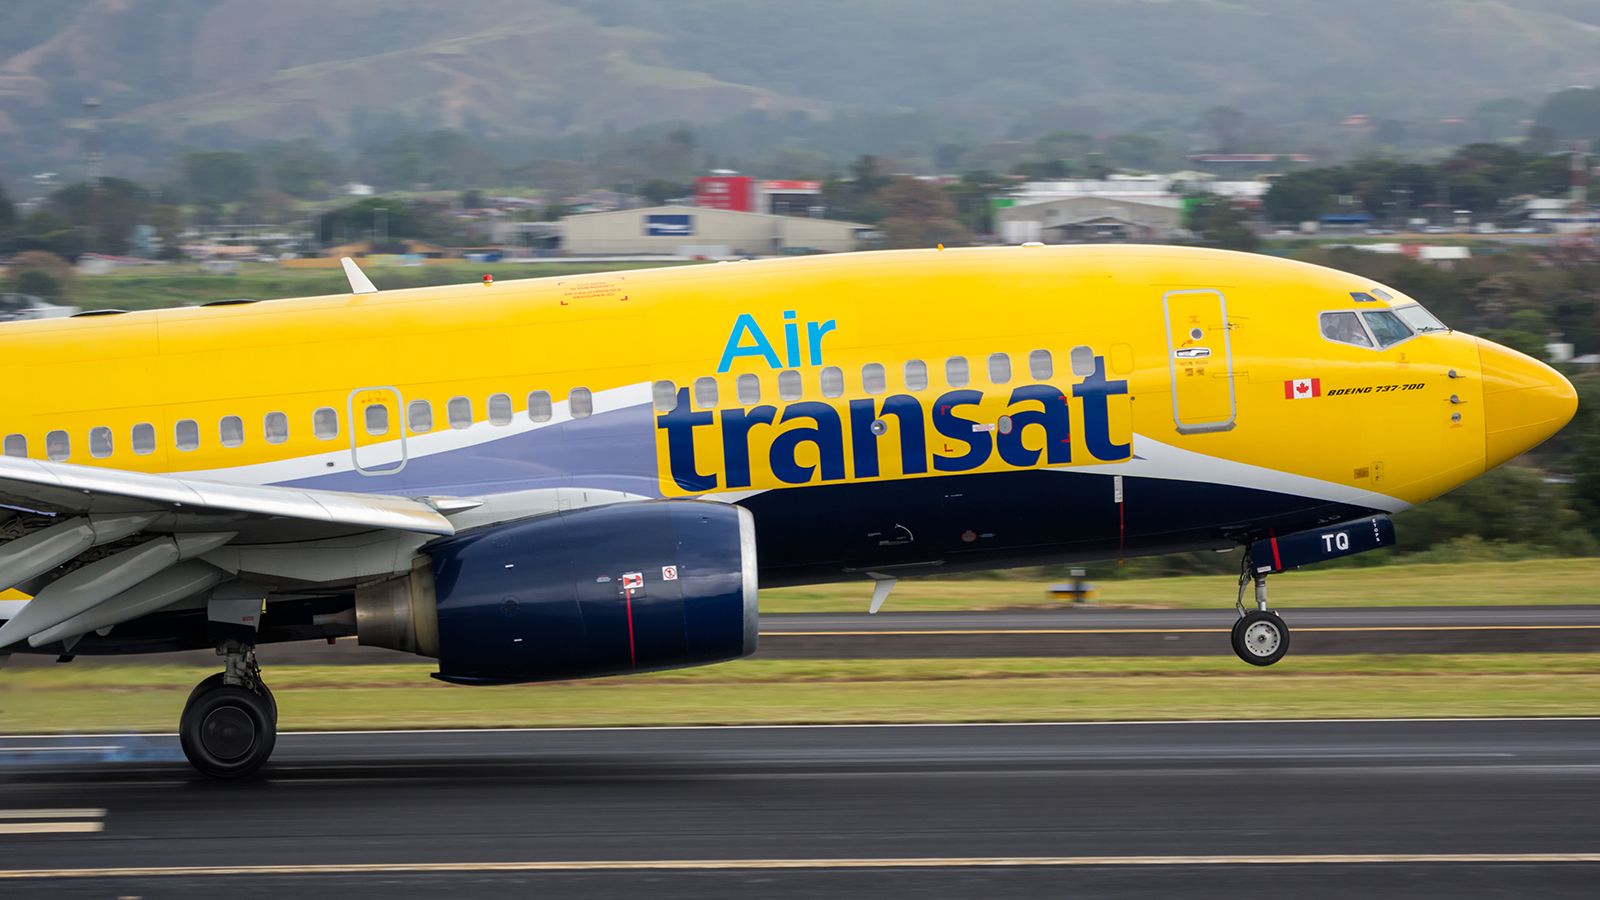 Click image for larger version.  Name:AirTransat_C-GTQI_17JAN18_1600_head.jpg Views:22 Size:800.1 KB ID:13149